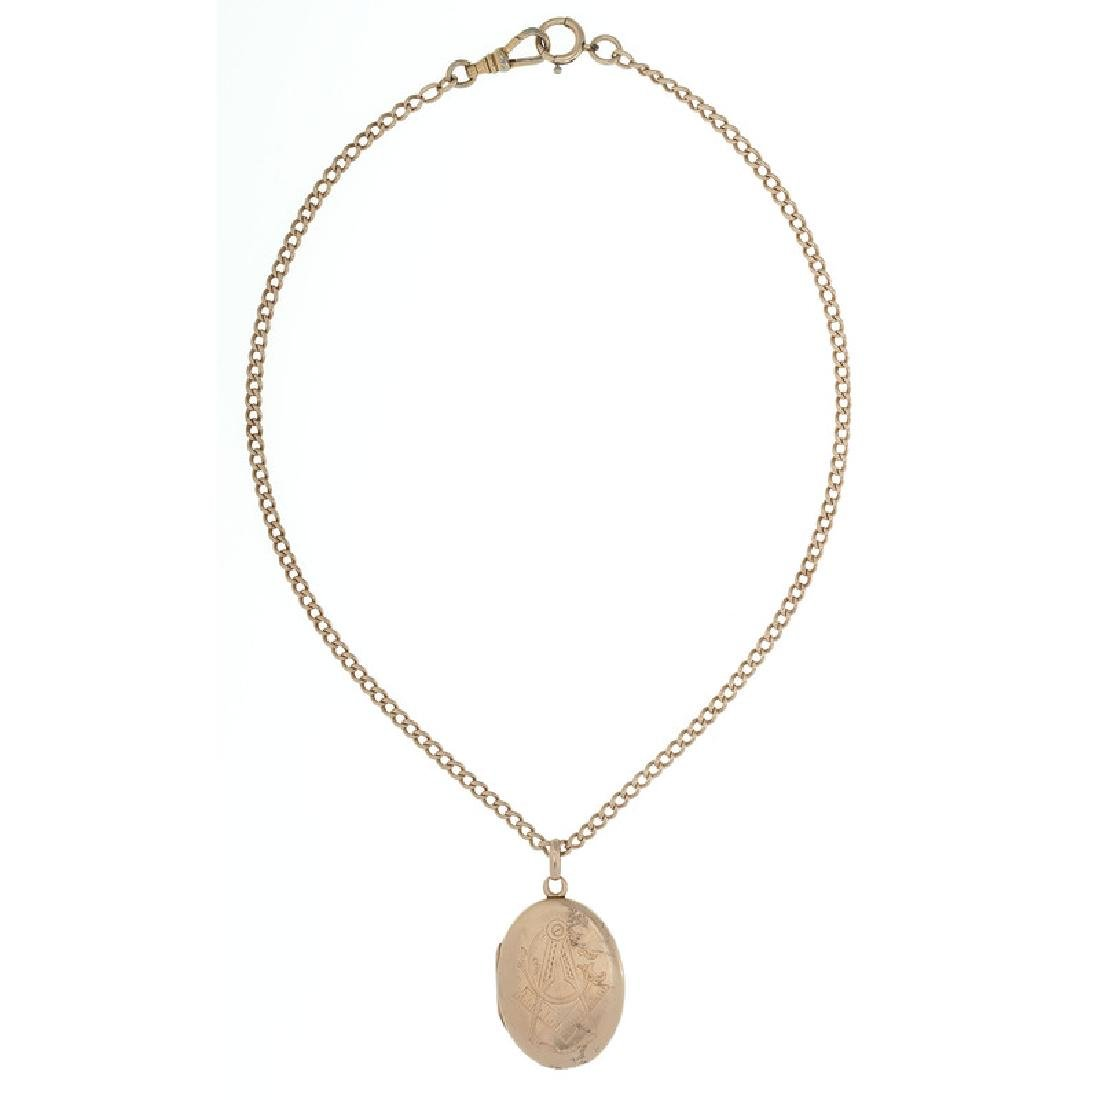 10 Karat Gold Fraternal Jewelry - 4